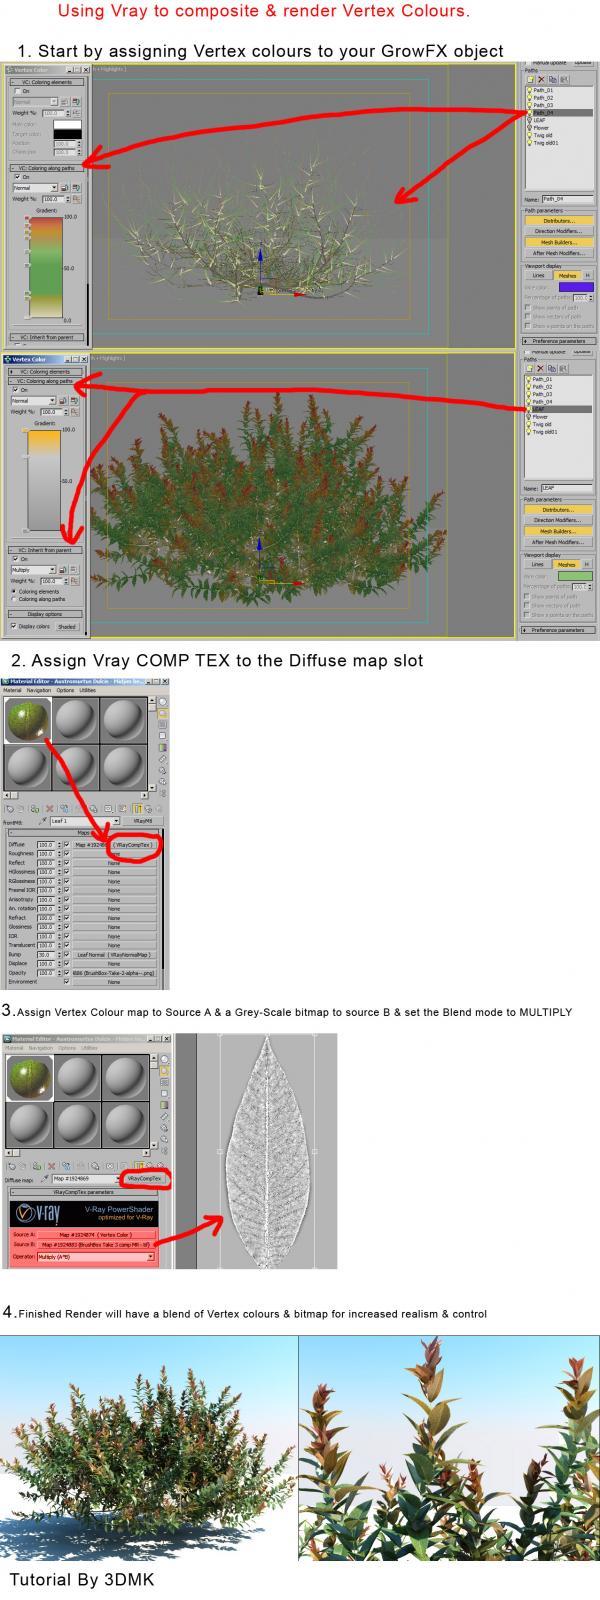 3dmk_Treeline_VertexColour_workflow